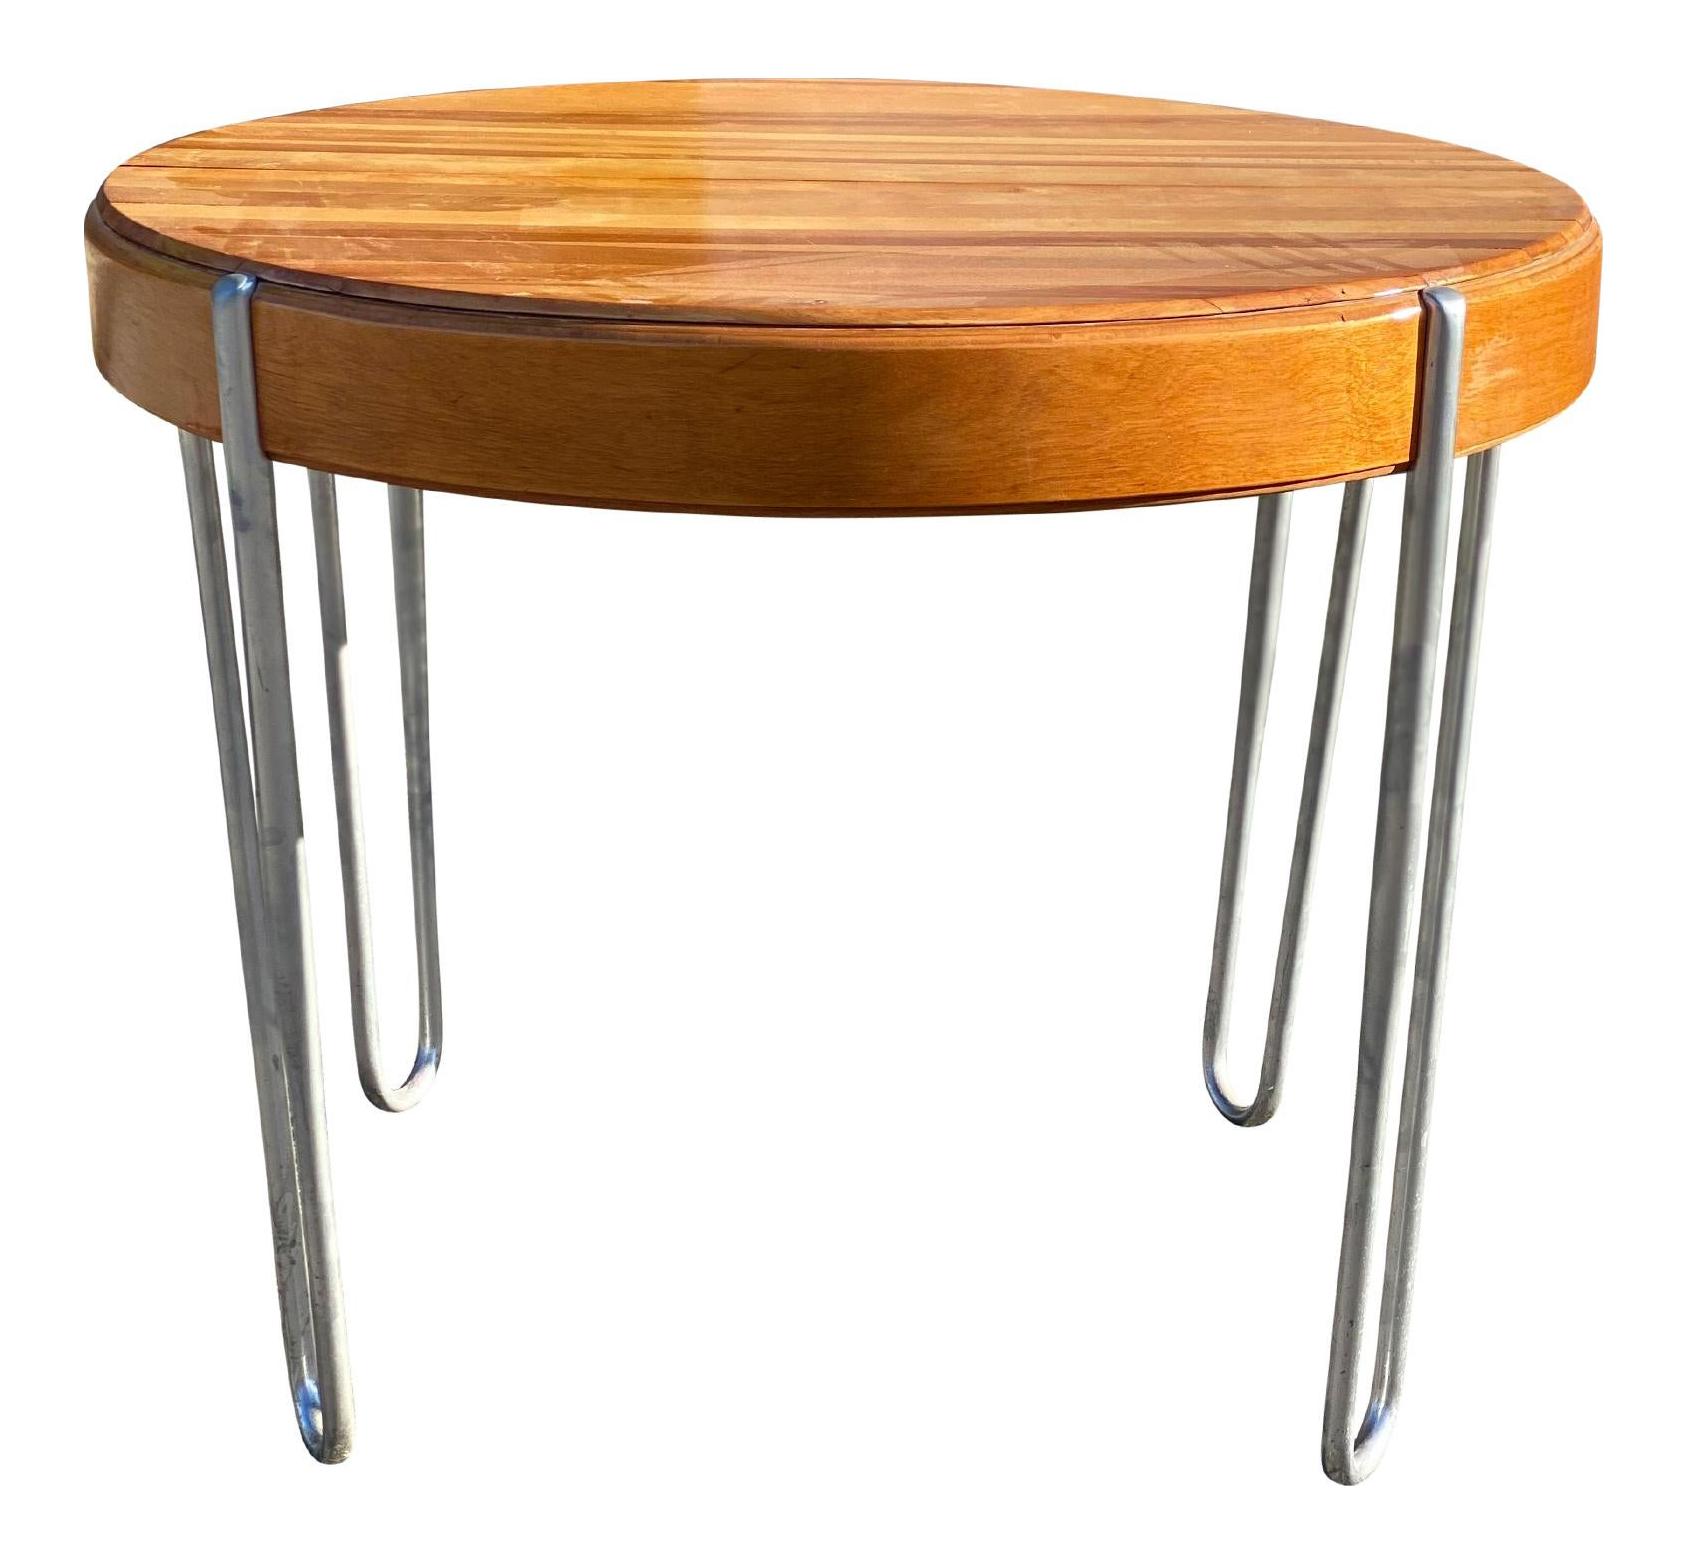 Vintage Mid Century Modern Round Wood Dining Pub Table W Hairpin Legs Chairish